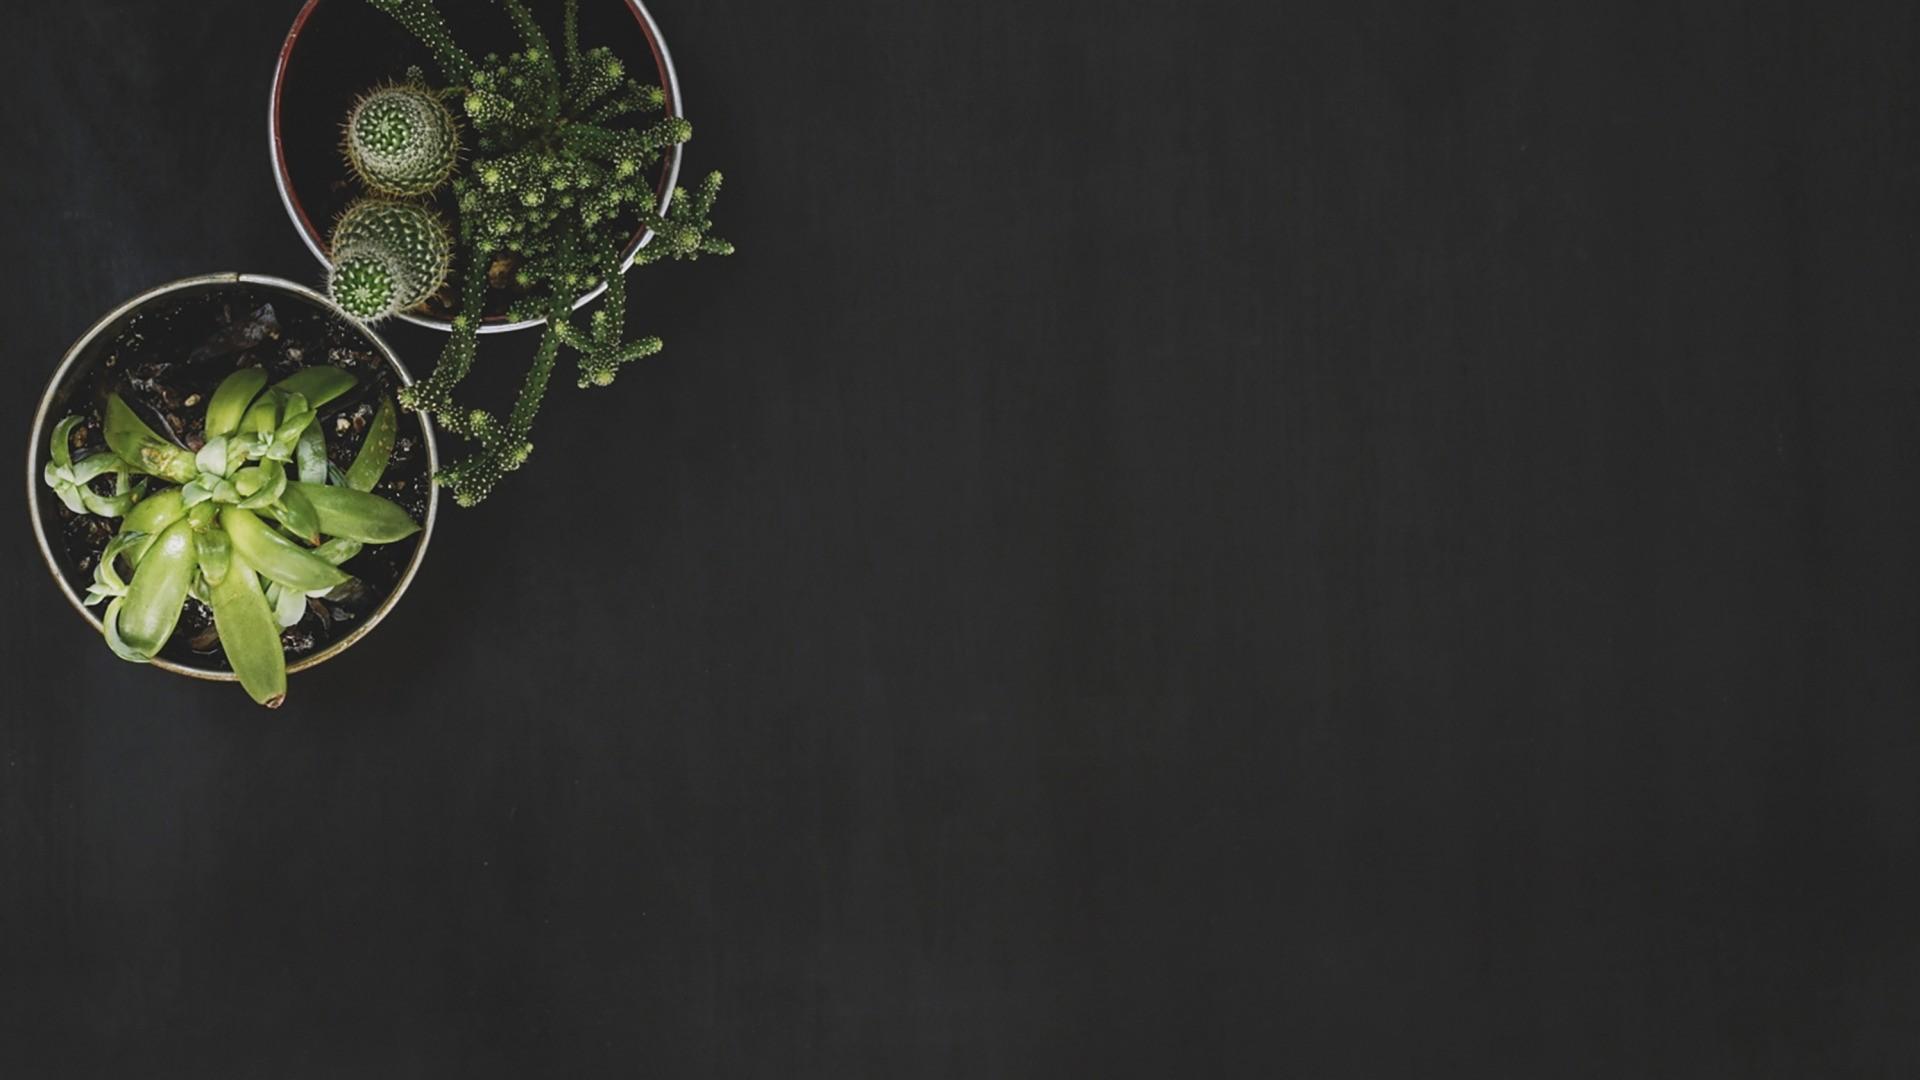 Cactus Minimalist desktop wallpaper hd